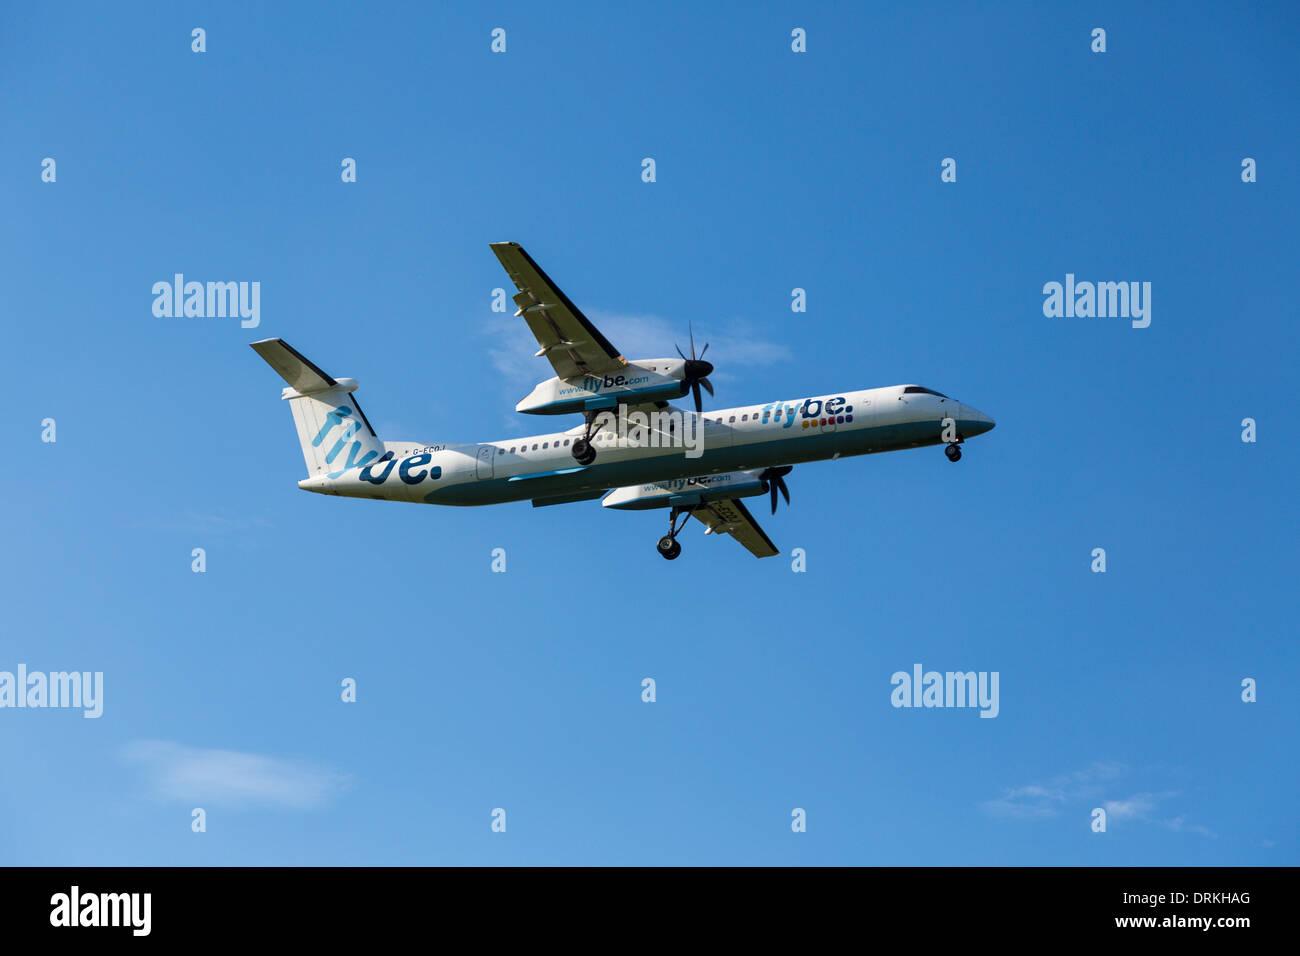 Flybe De Havilland dash 8 to land - Stock Image